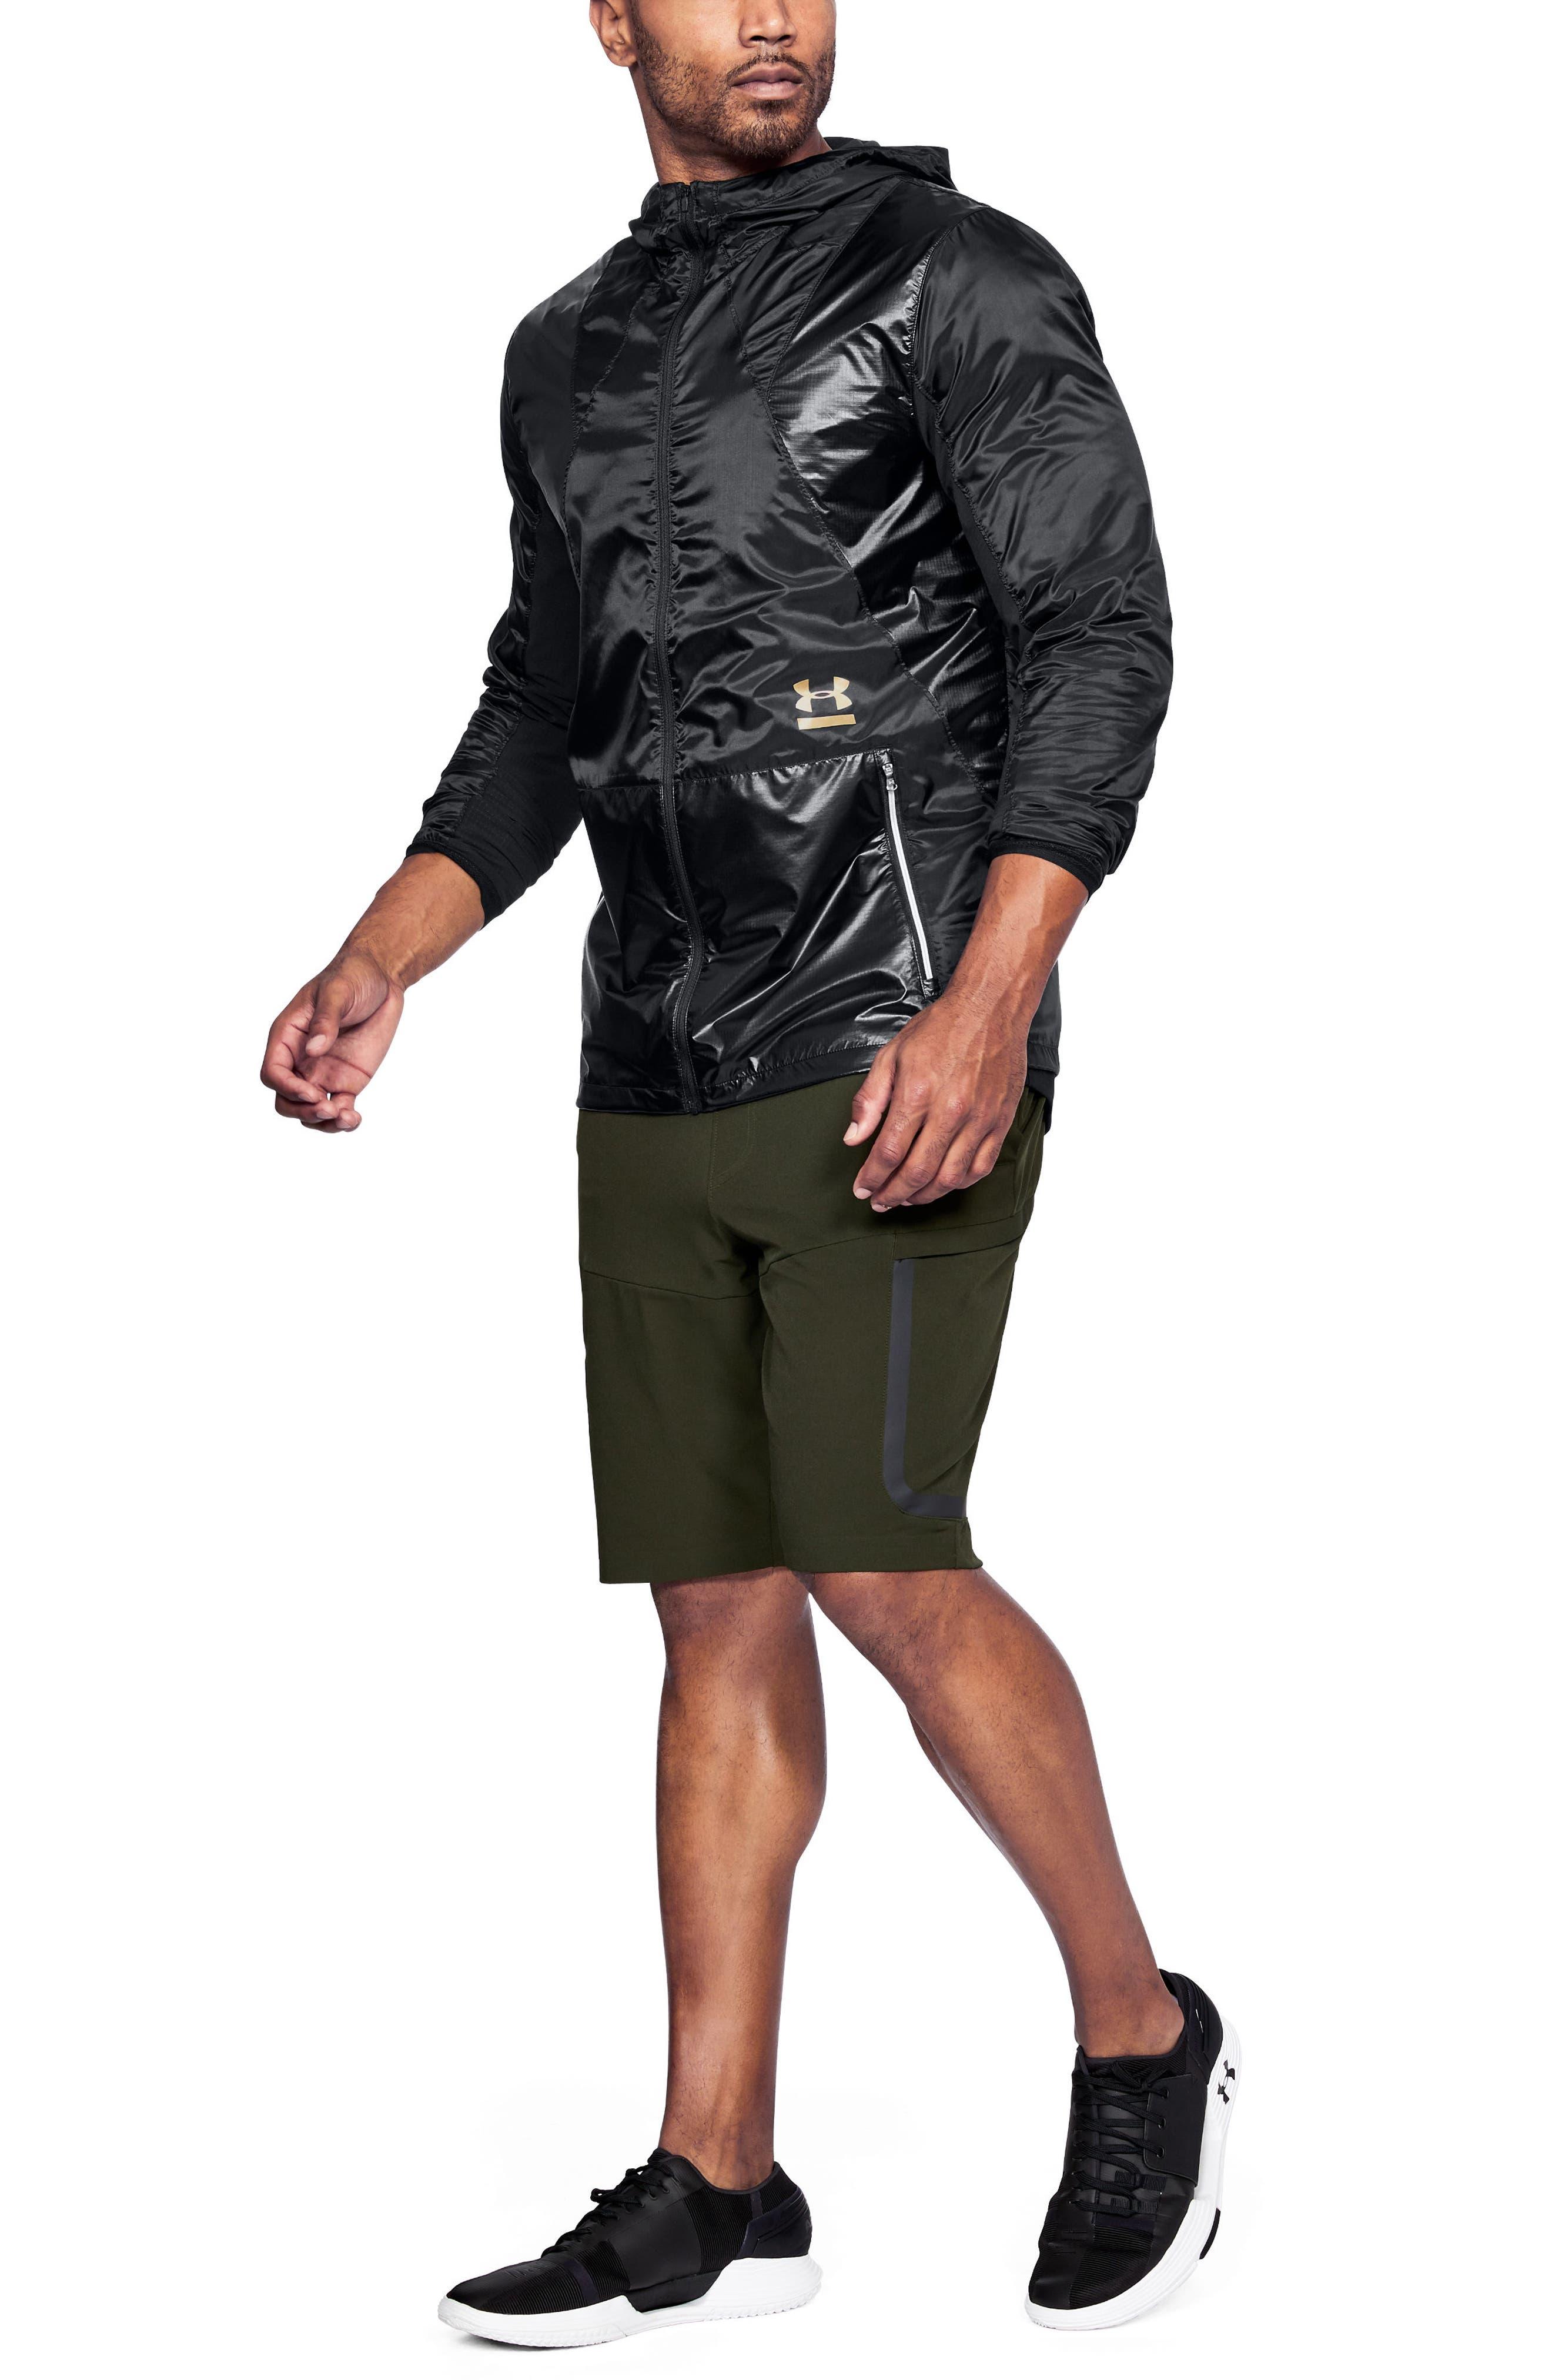 Perpetual Windproof & Water Resistant Hooded Jacket,                             Alternate thumbnail 4, color,                             Black/ Metallic Victory Gold